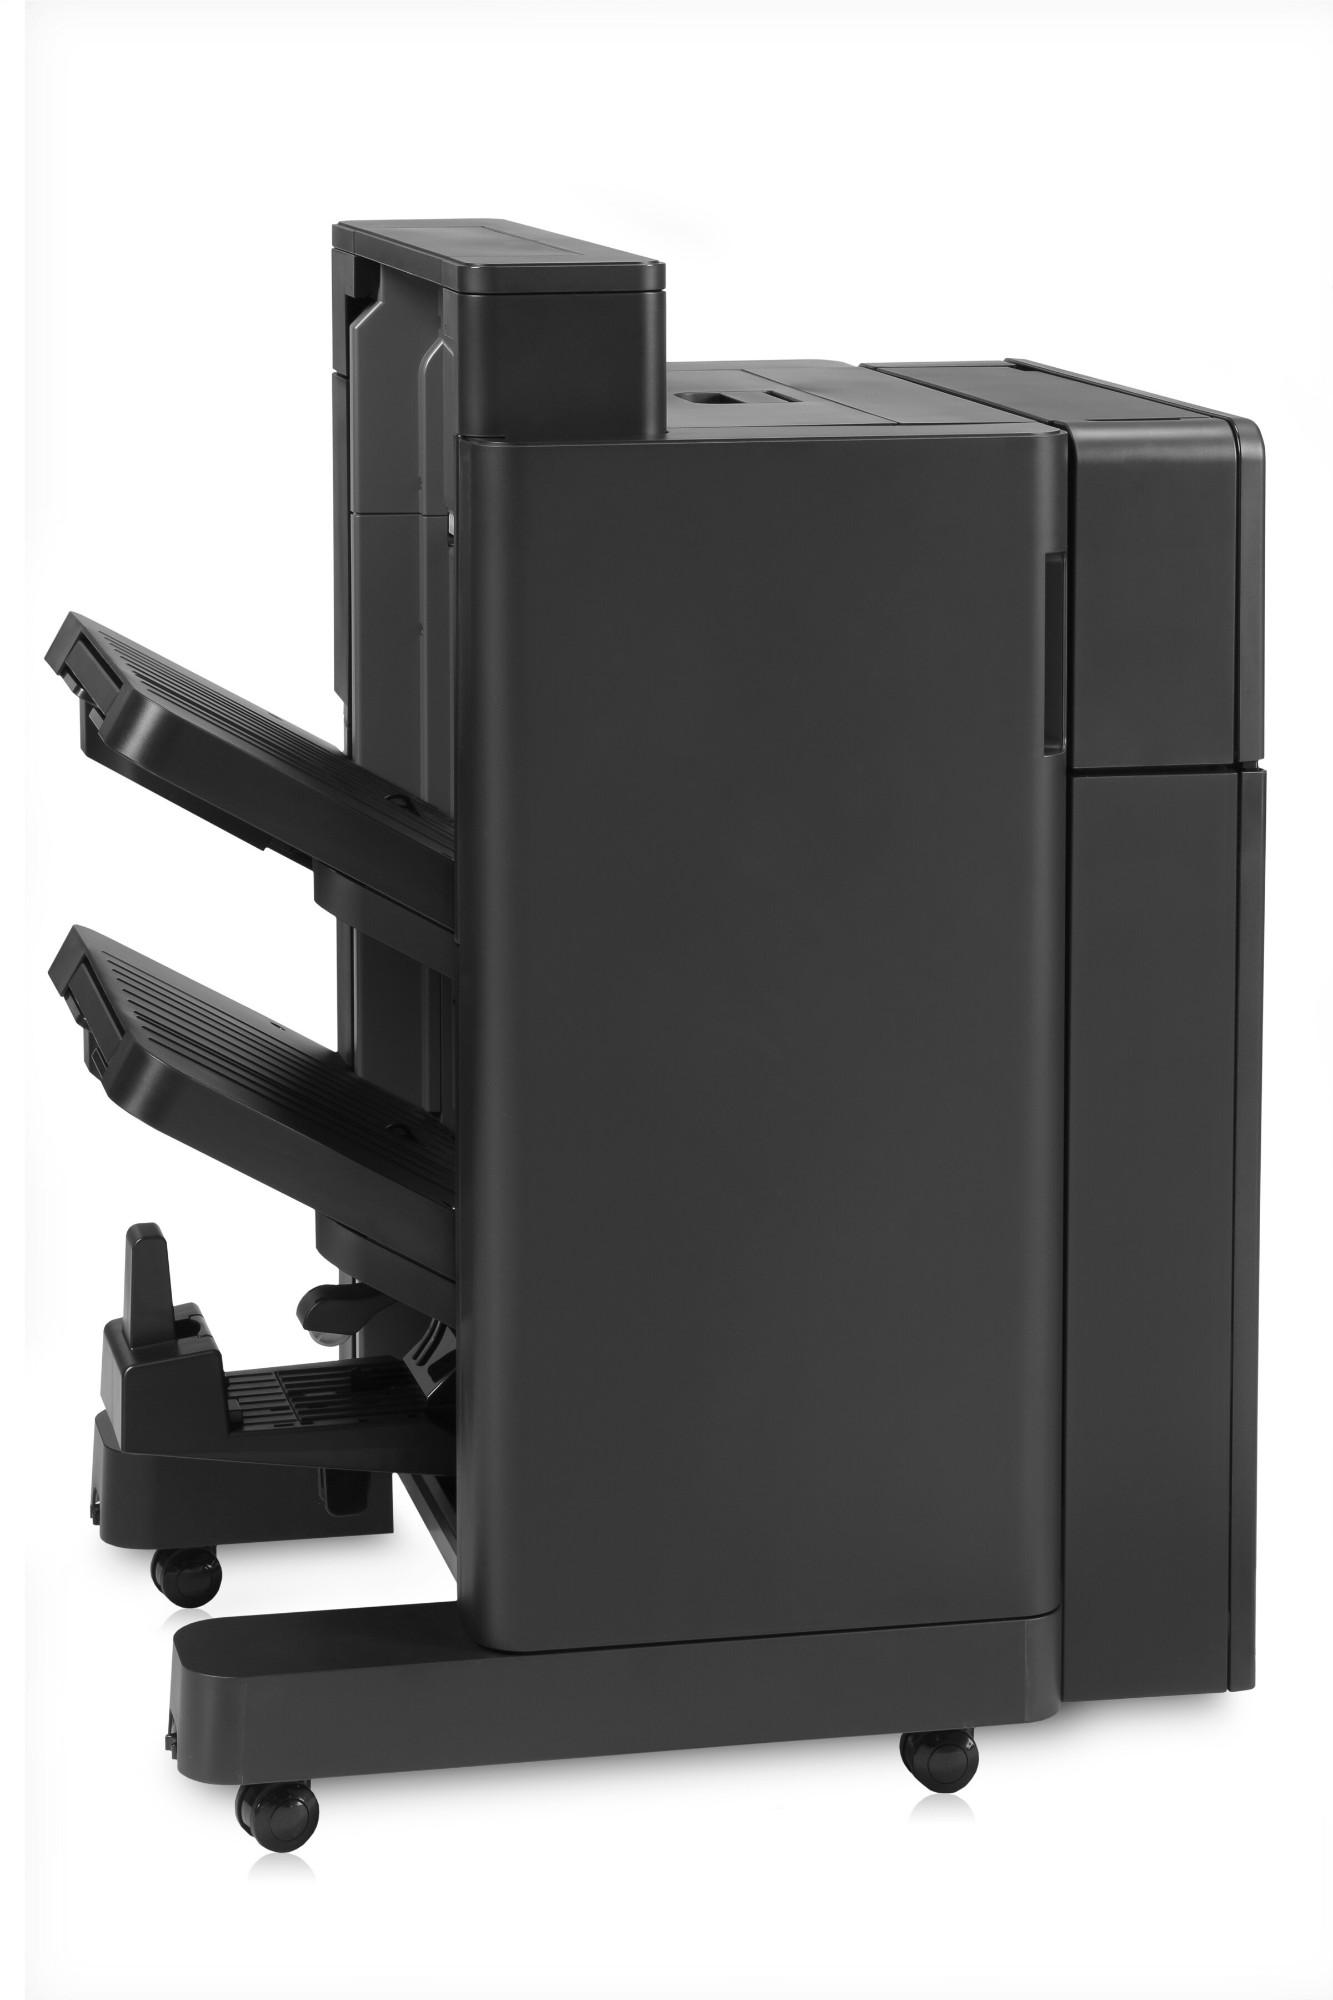 HP Color LaserJet Booklet Maker/Finisher with 2/4 hole punch output stacker